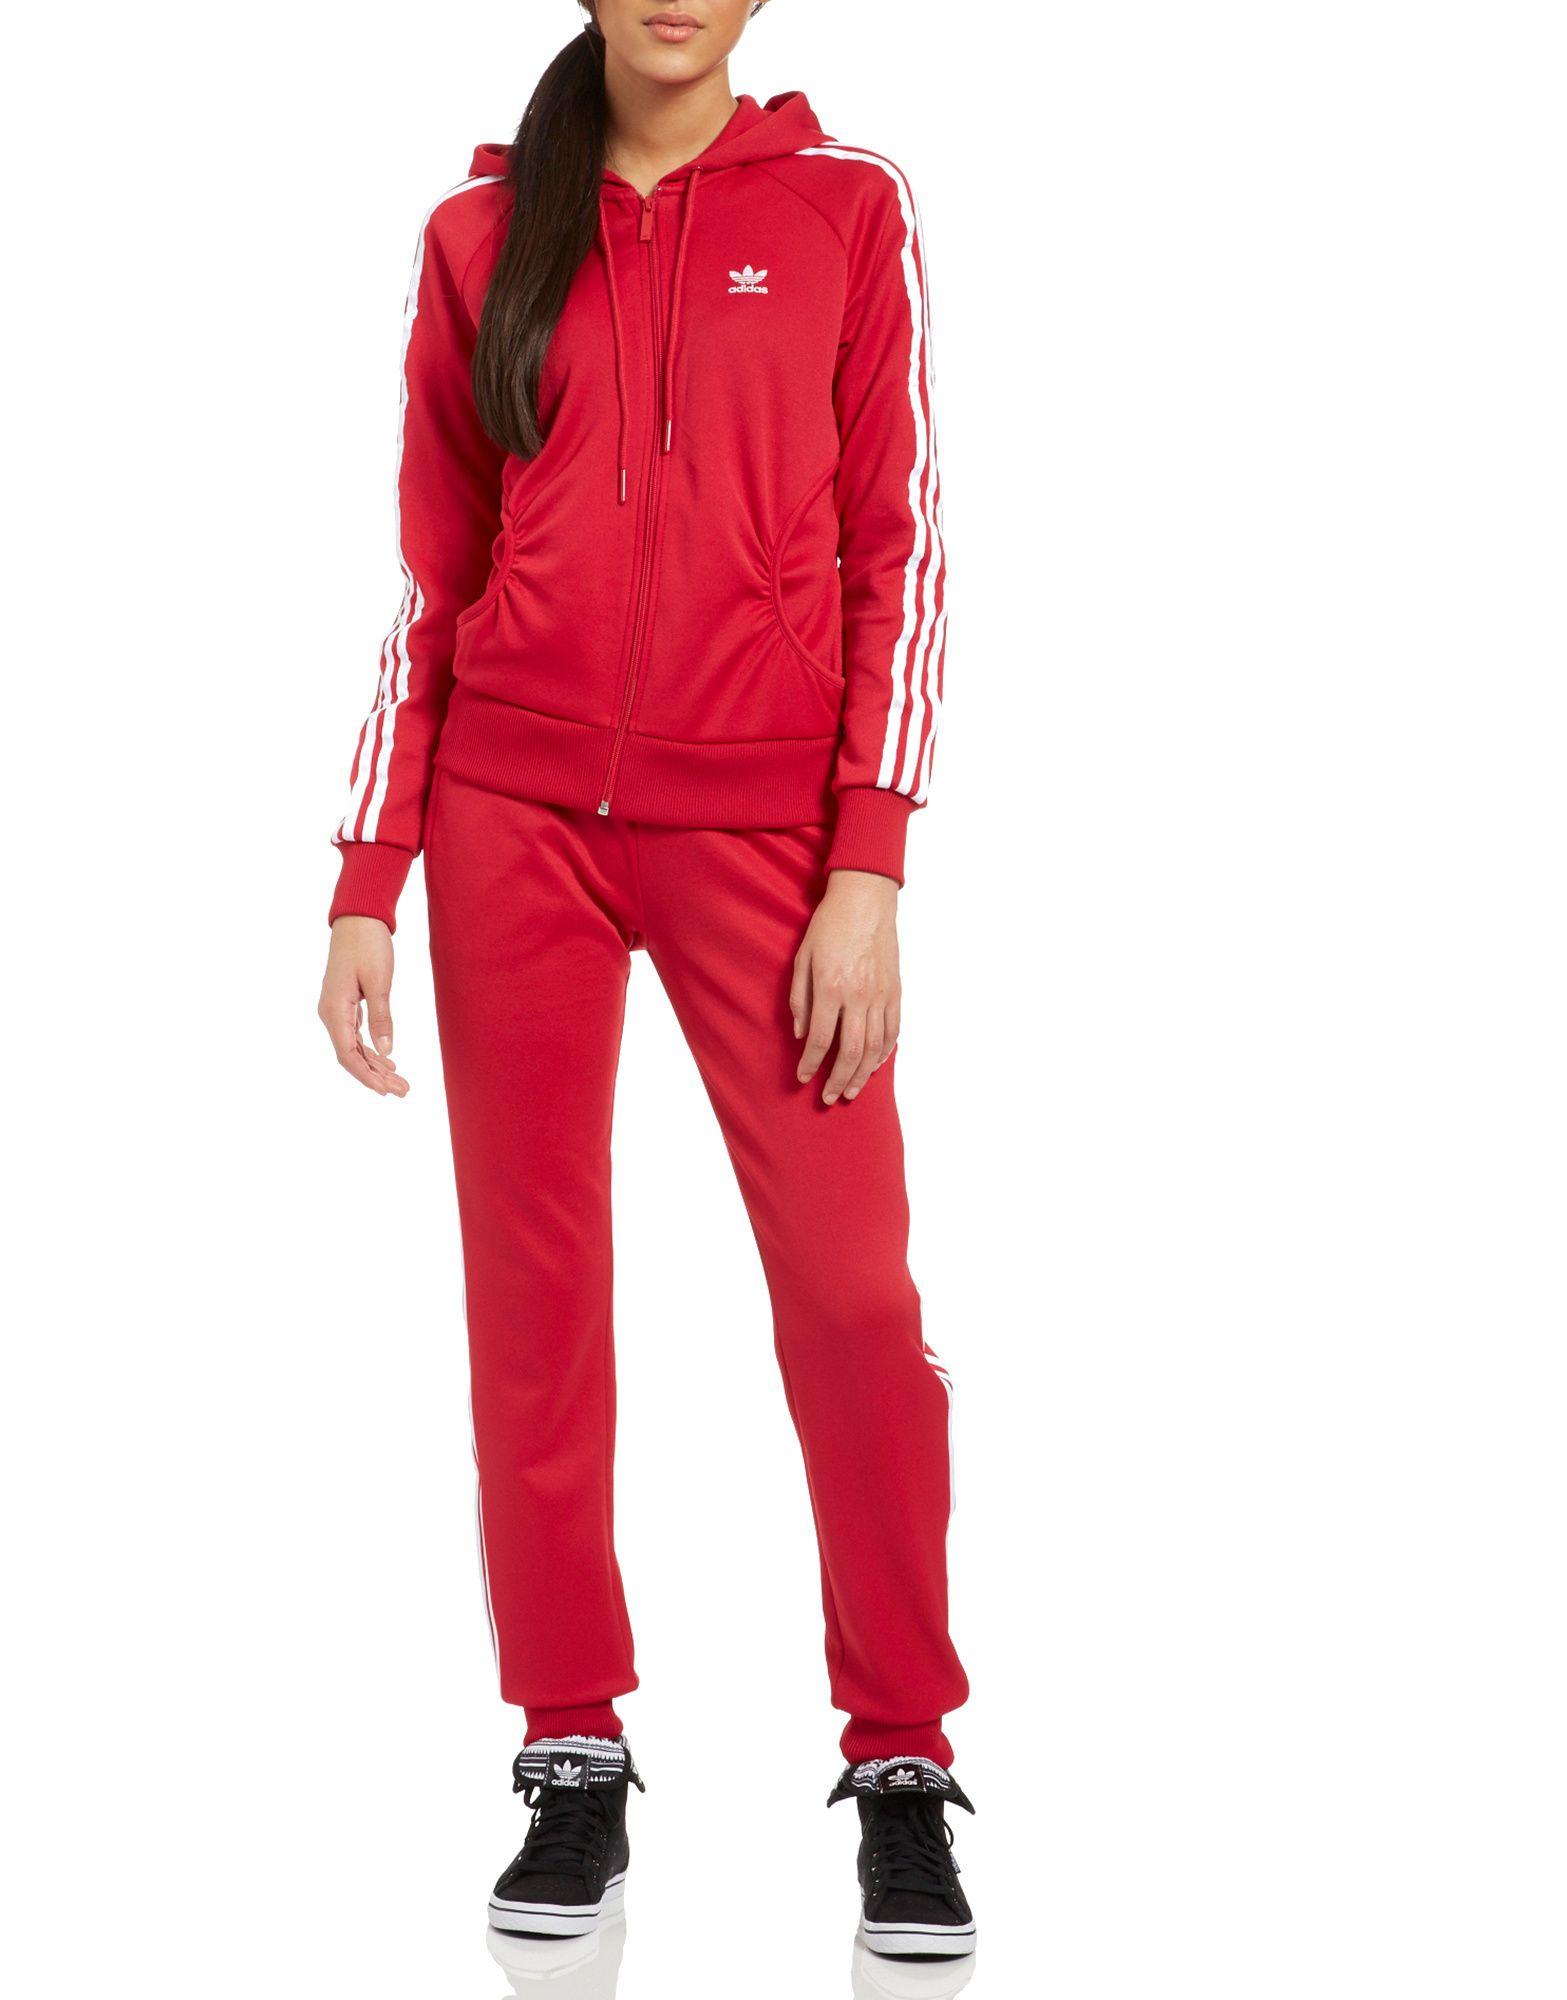 adidas Originals Girly Track Pants